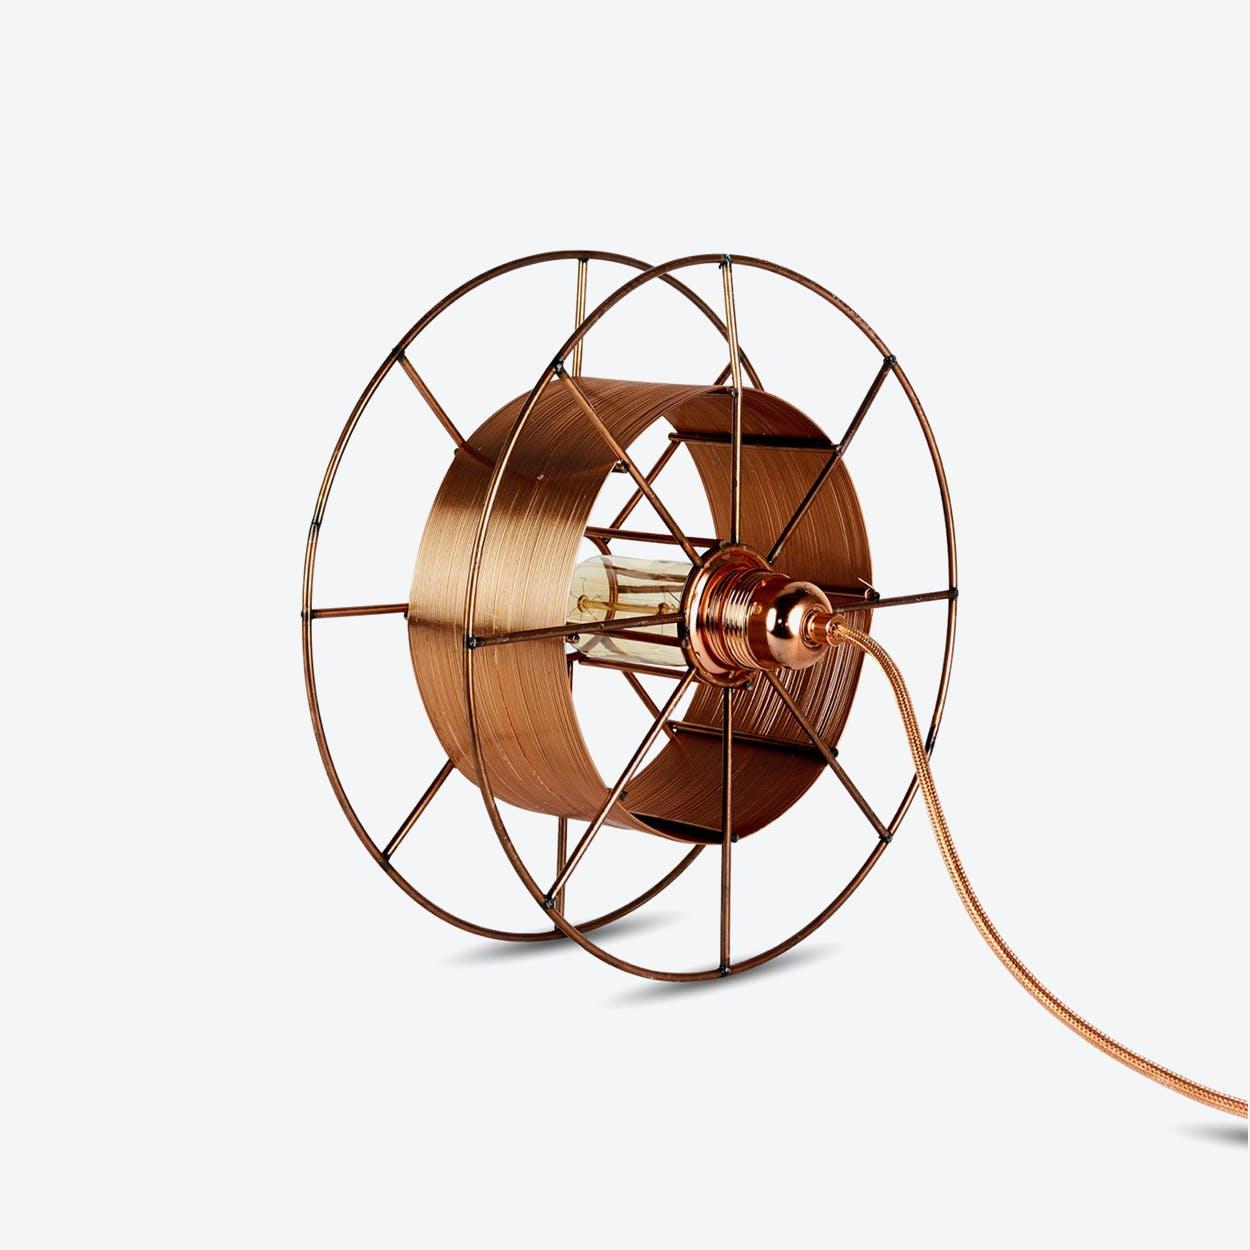 Spool Floor Lamp in Copper